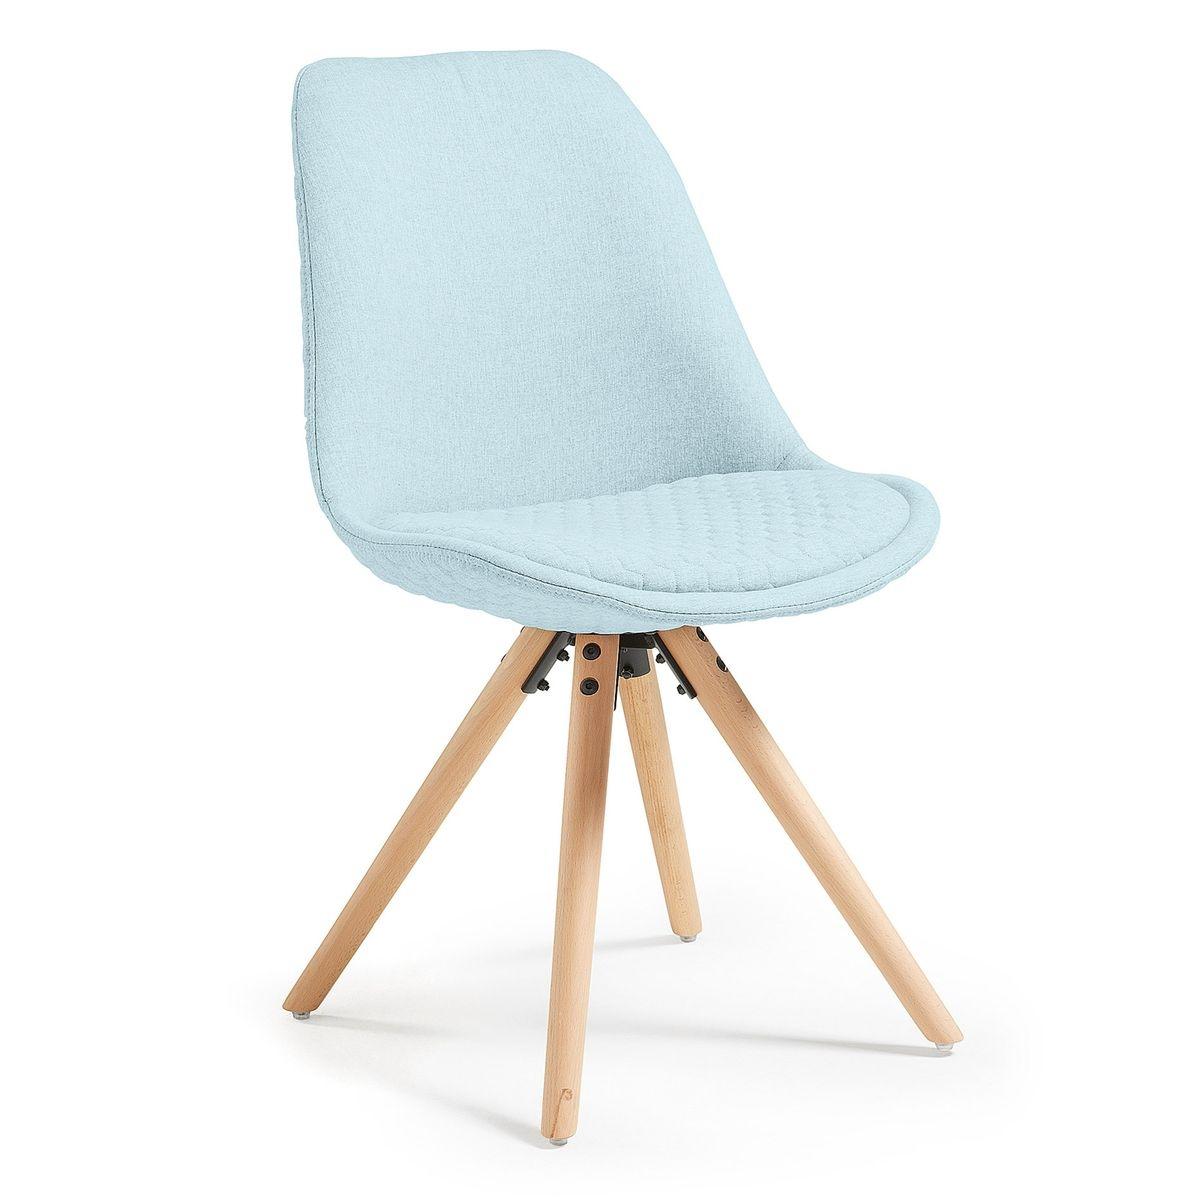 Chaise Ralf, naturel et tissu bleu clair